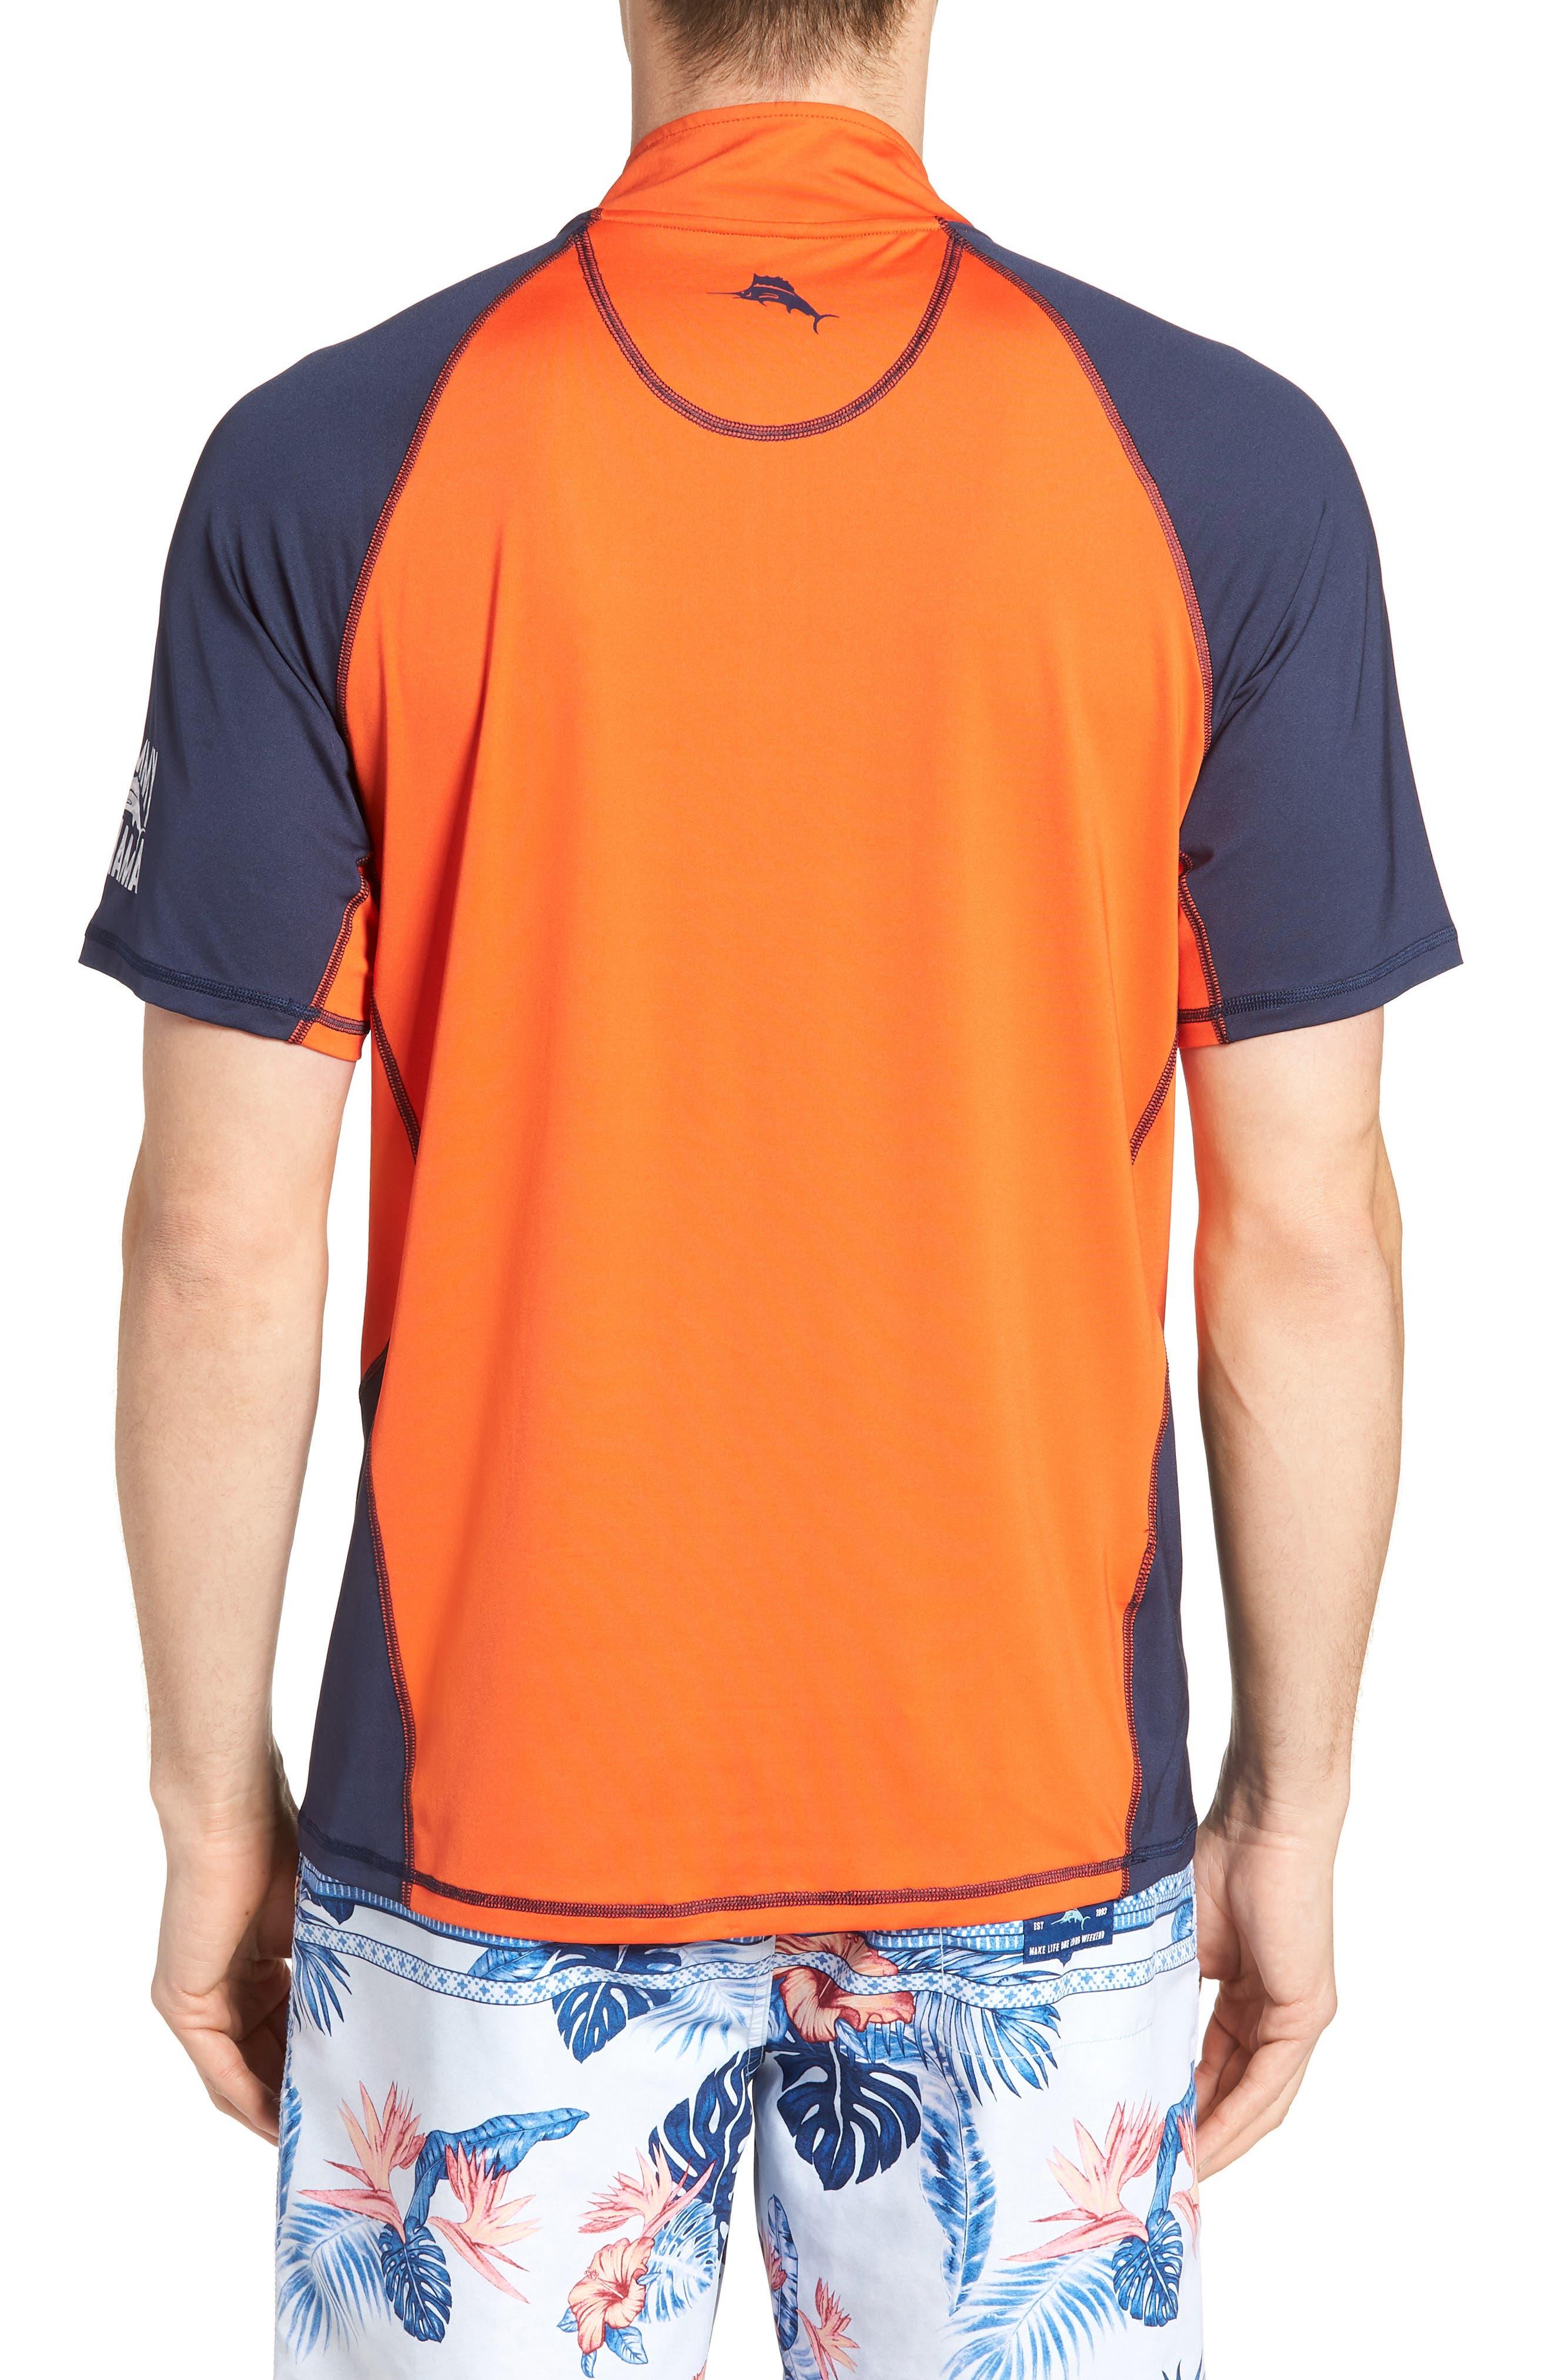 IslandActive<sup>™</sup> Colorblock Beach Pro Rashguard T-Shirt,                             Alternate thumbnail 2, color,                             Fire Orange